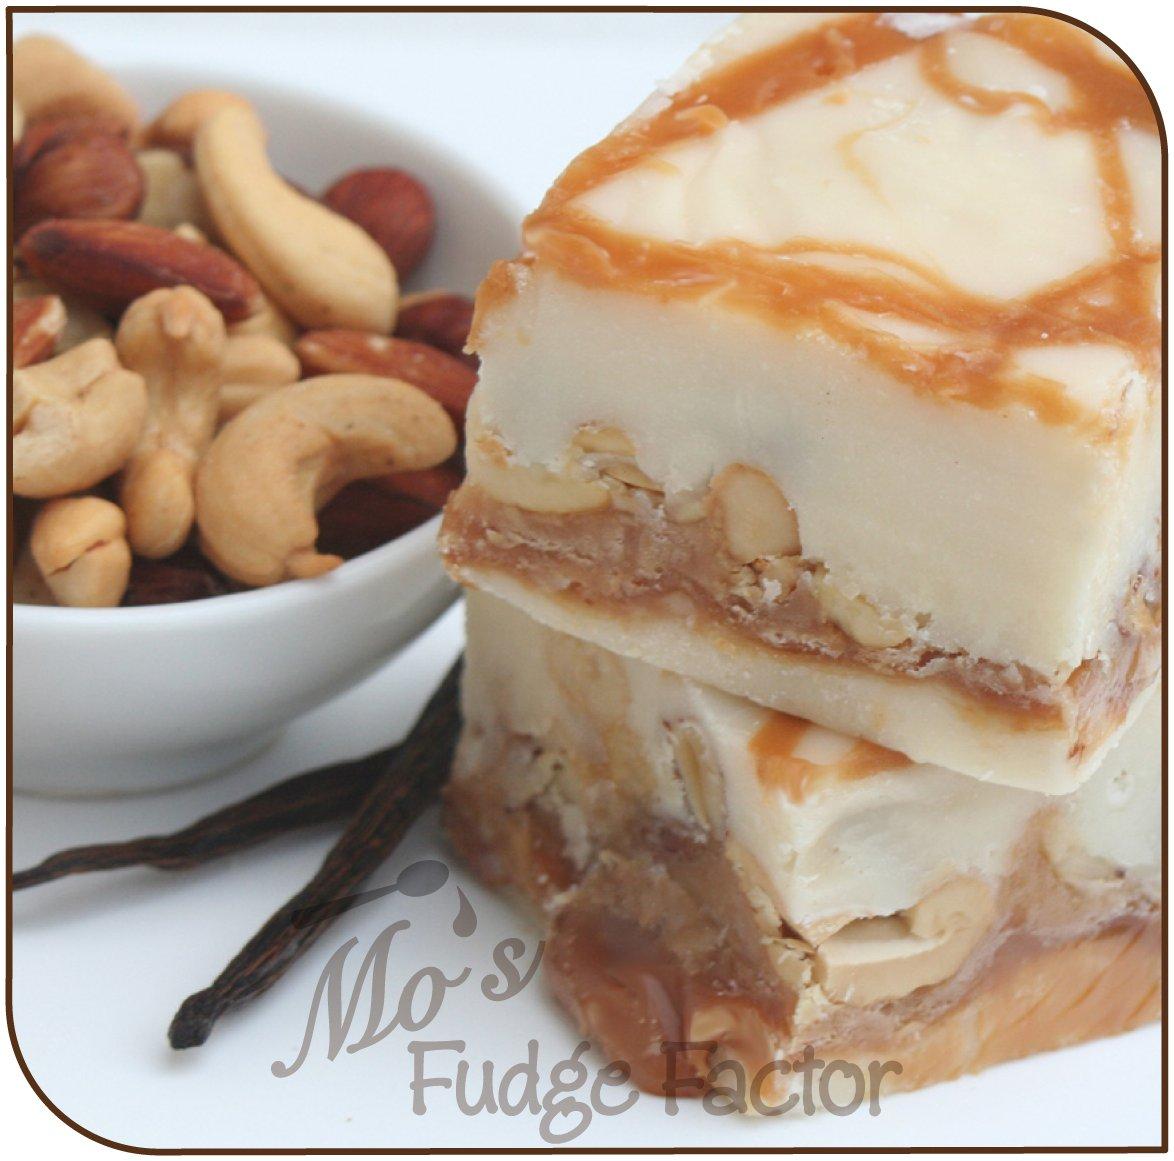 Mo's Fudge Factor, Vanilla Caramel Nut Fudge 2 pounds